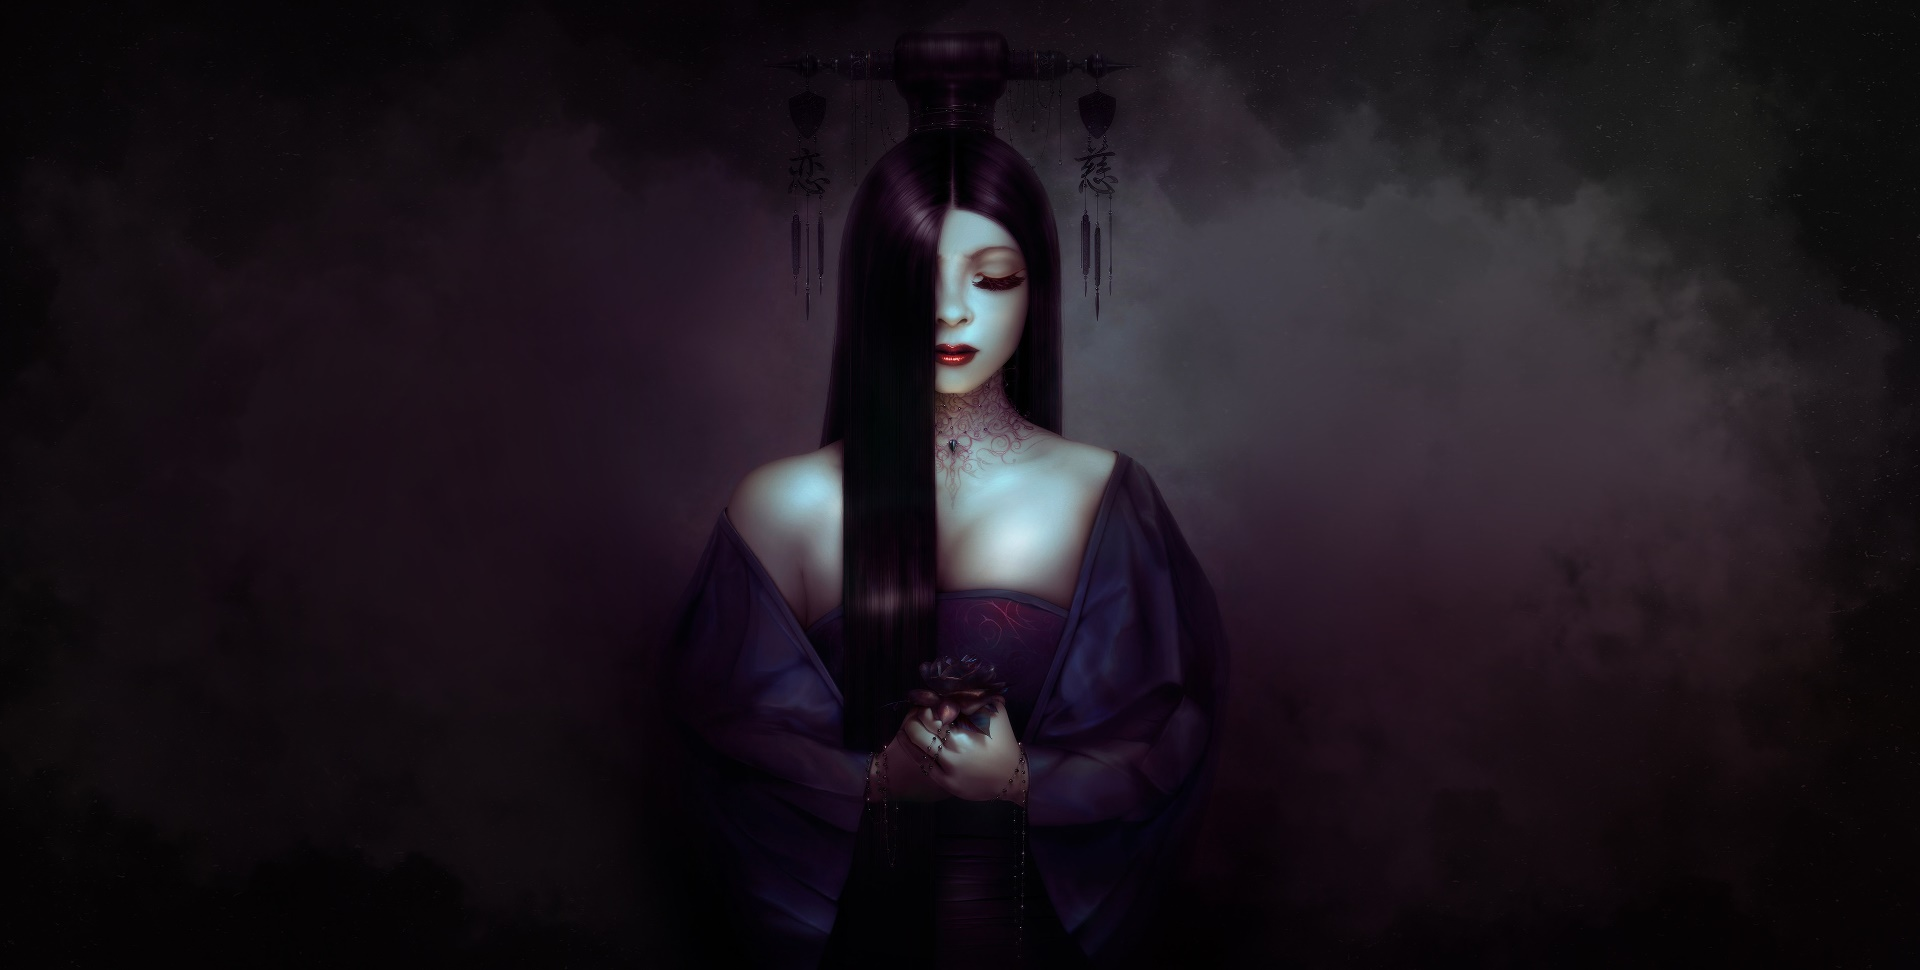 General 1920x970 women artwork fantasy girl dark dark hair fantasy art red lipstick closed eyes long hair